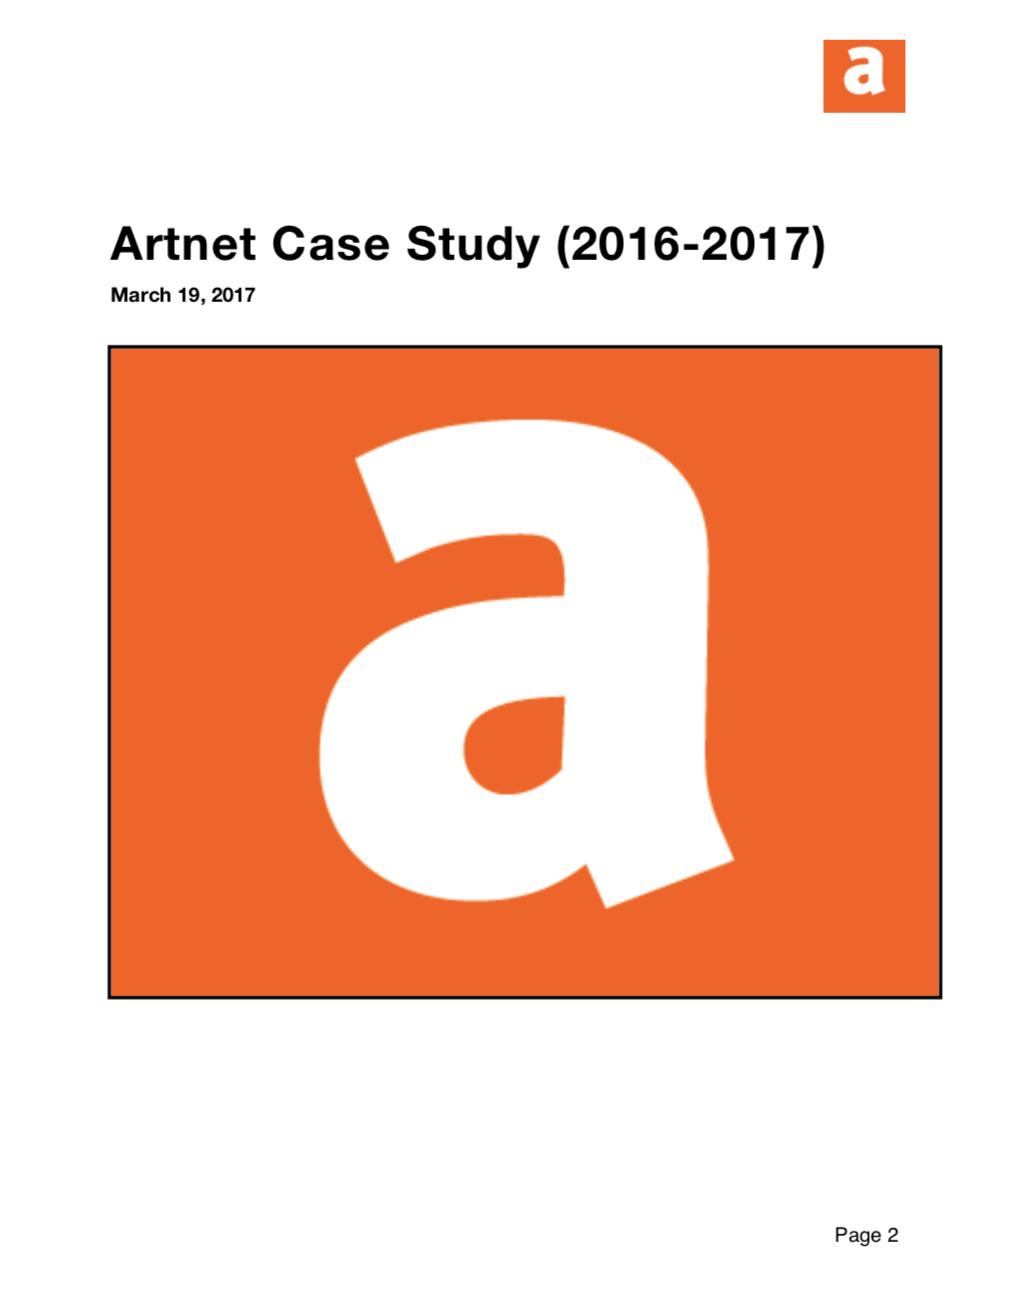 Artnet Case Study (2016-2017)